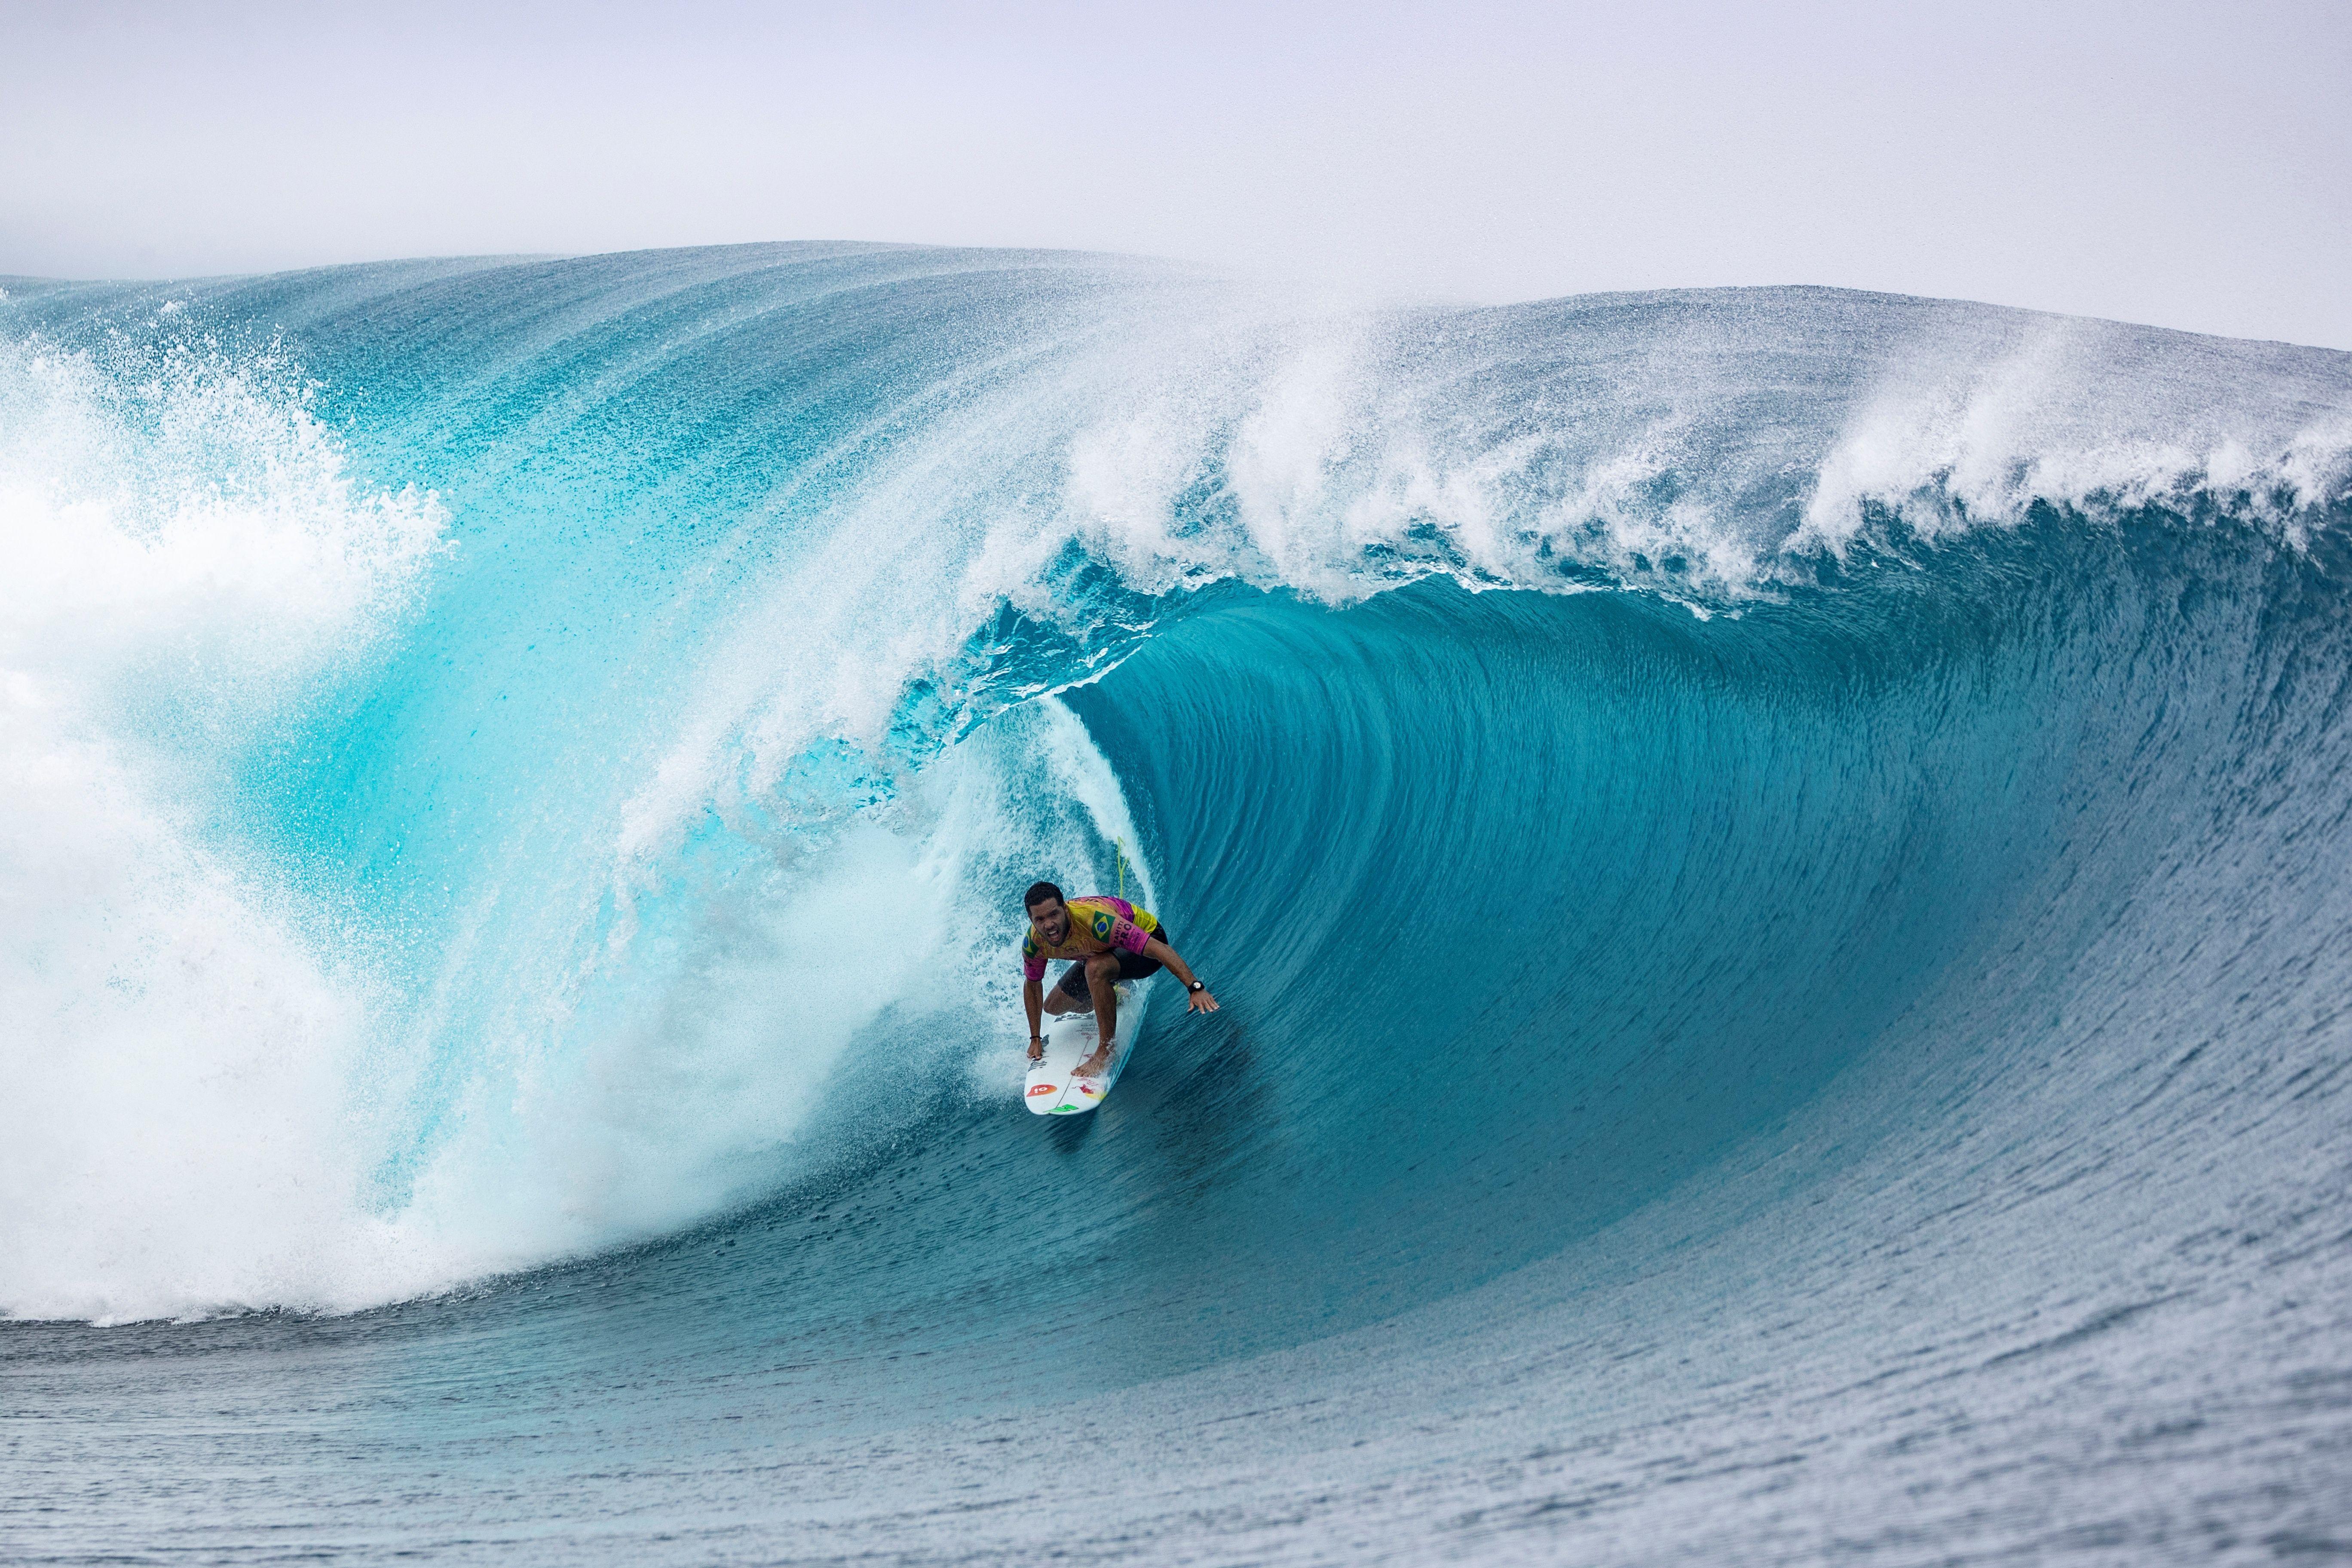 Surfing through a wave